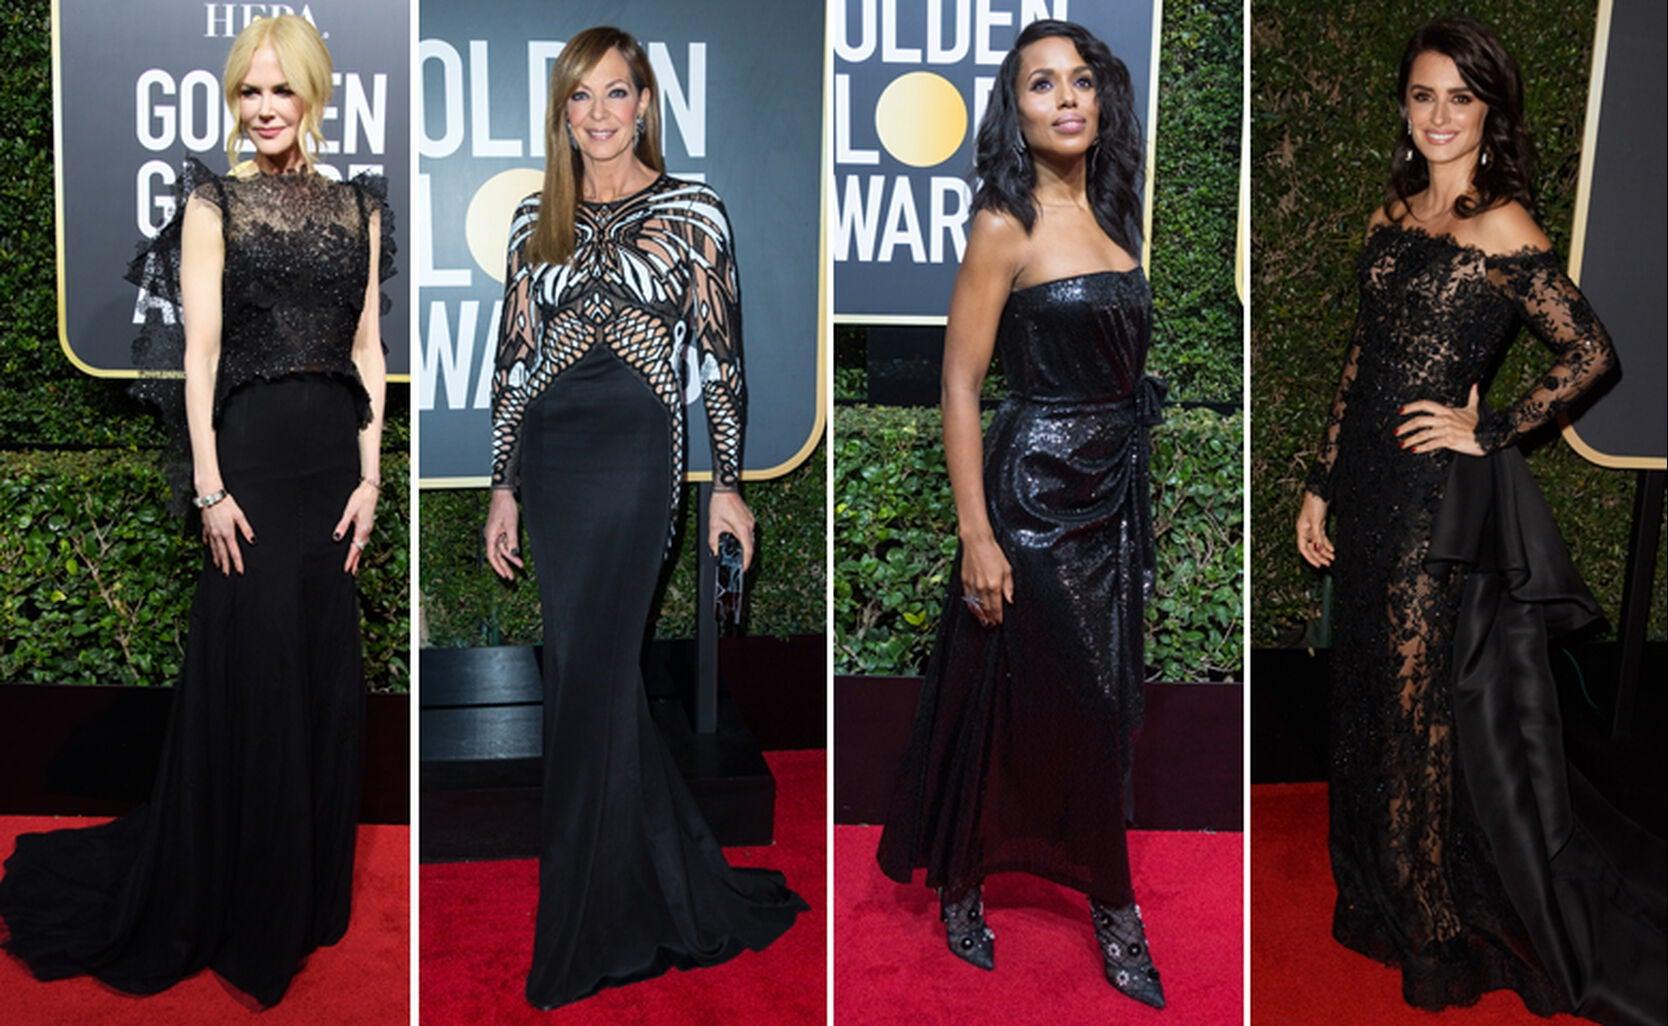 Nicole Kidman, Allison Janney, Kerry Washington and Penelope Cruz